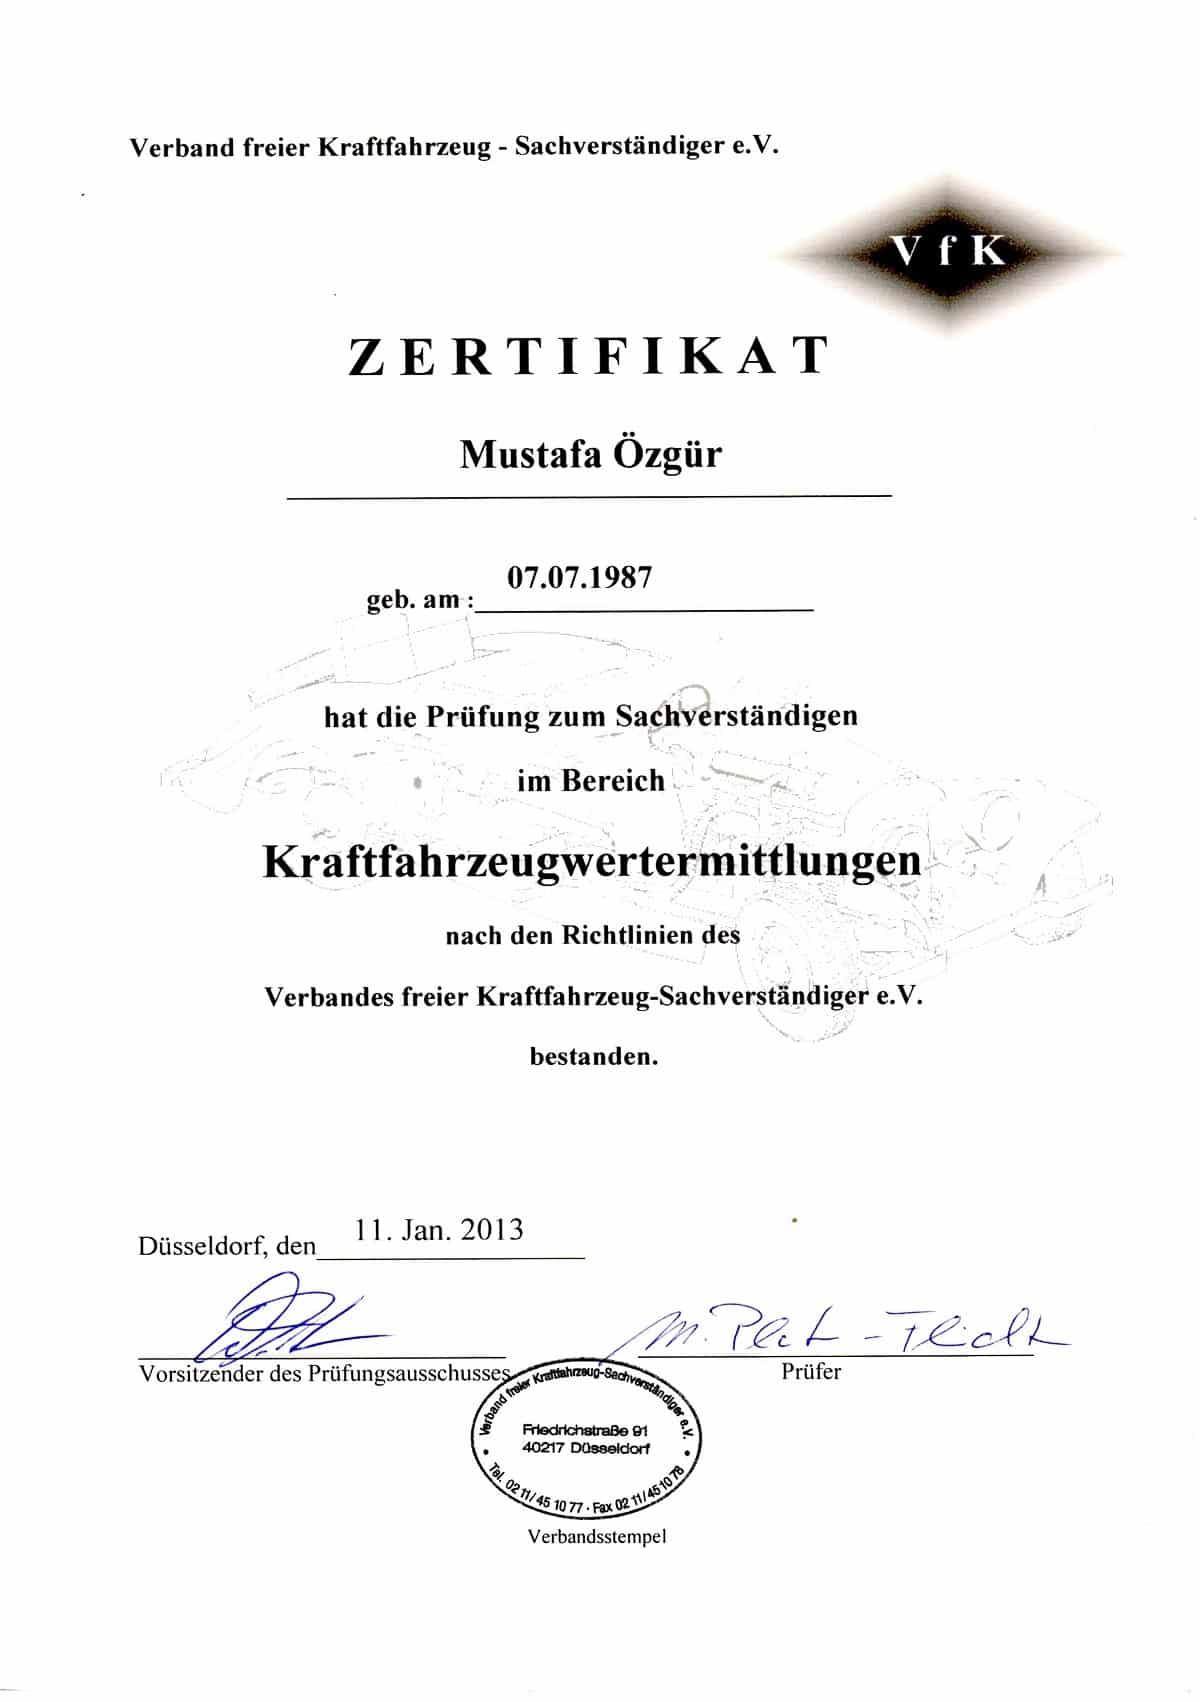 KFZ Wertermittlung Zertifikat